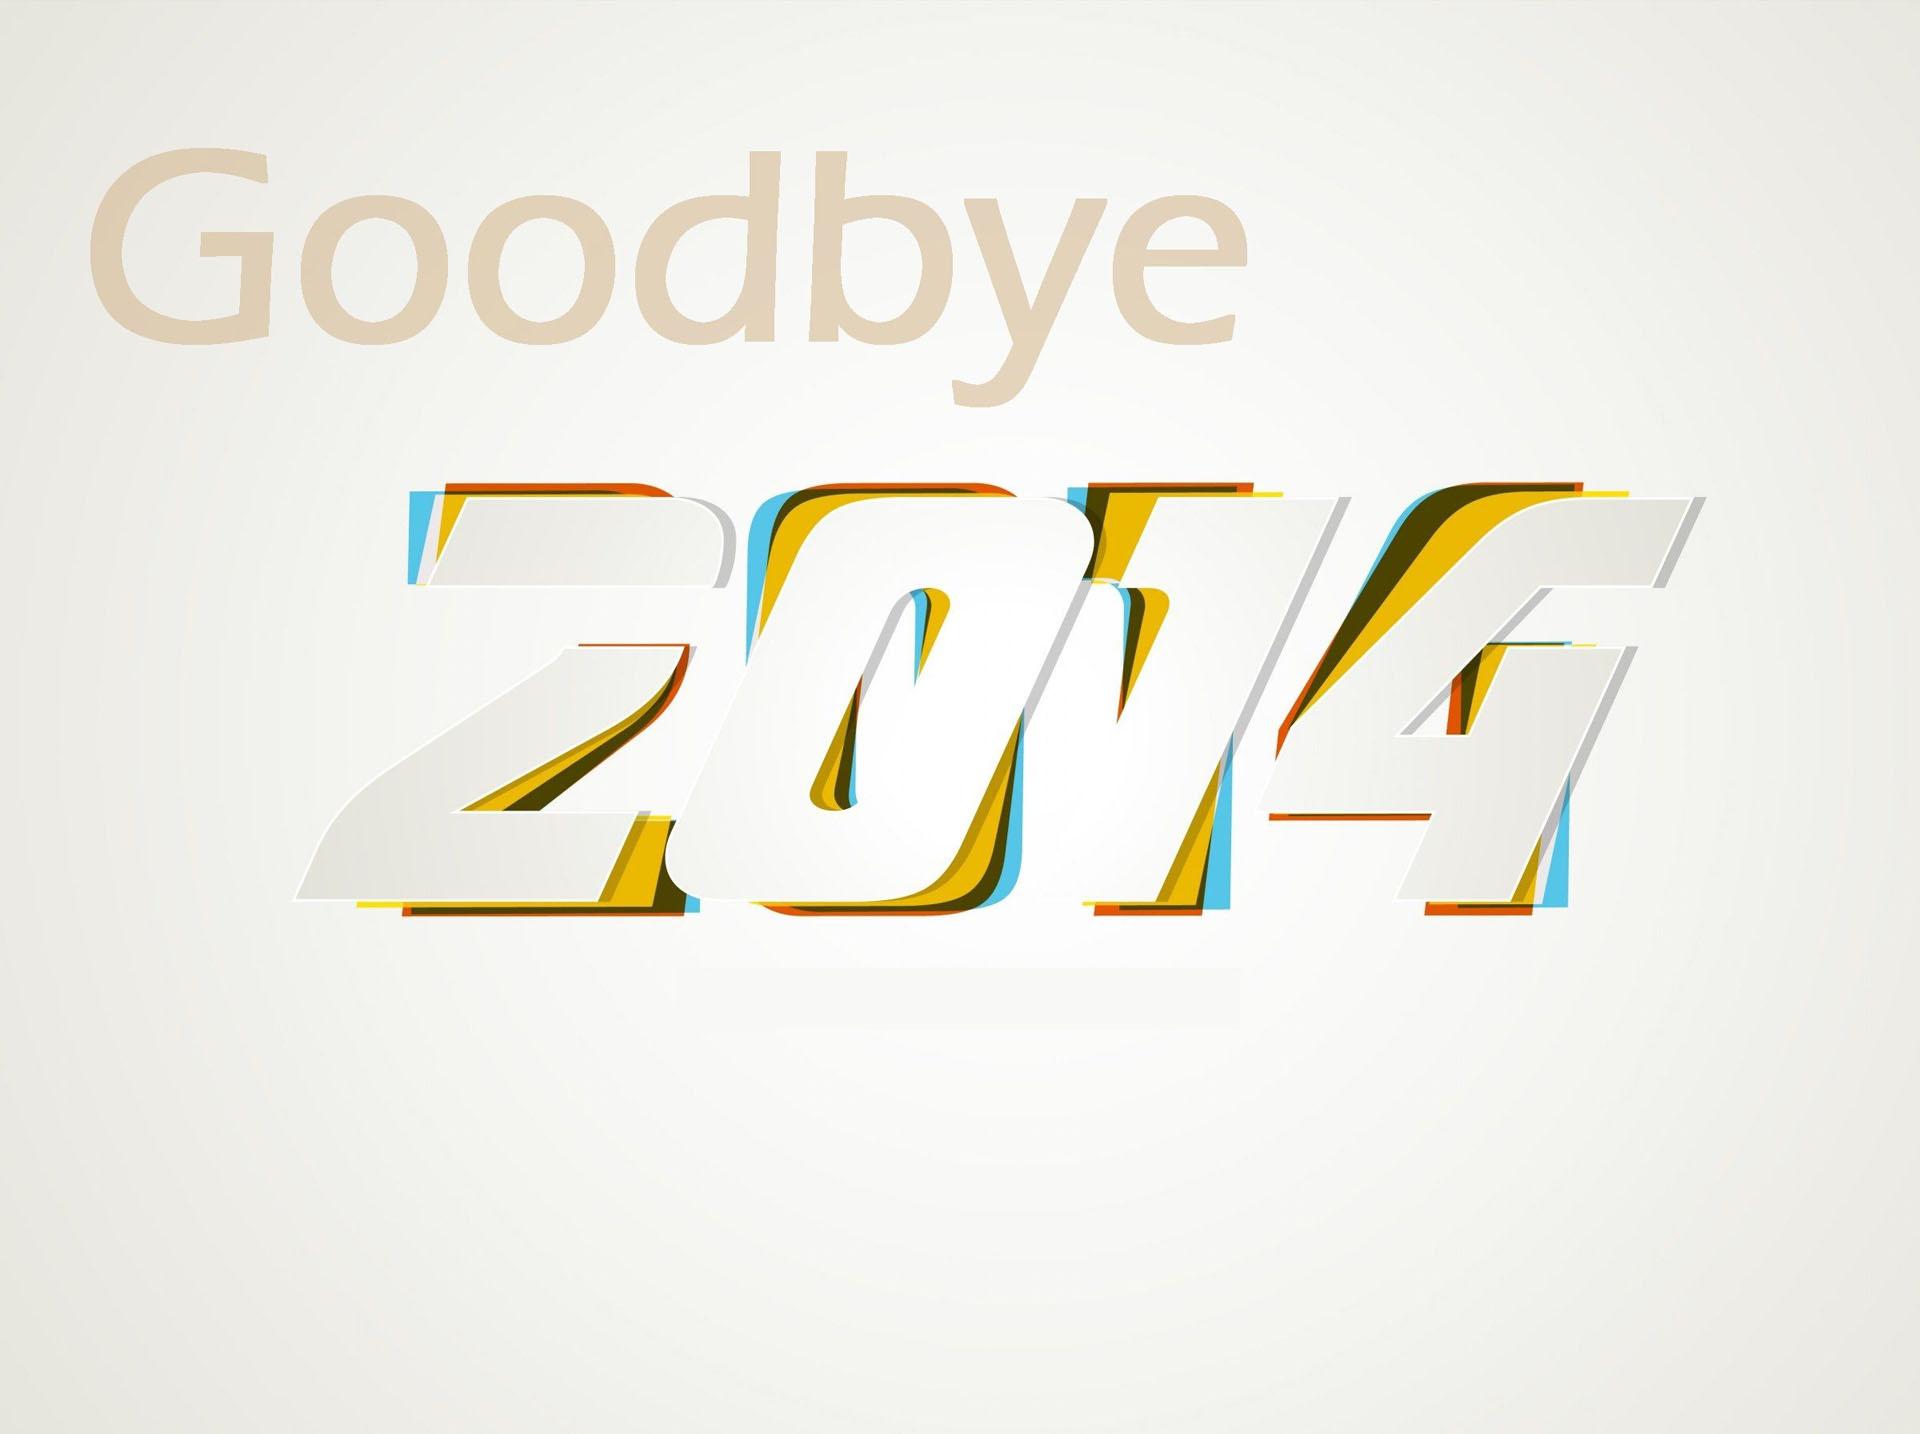 Goodbye 2014 beautiful wallpaper in HD 1920x1434